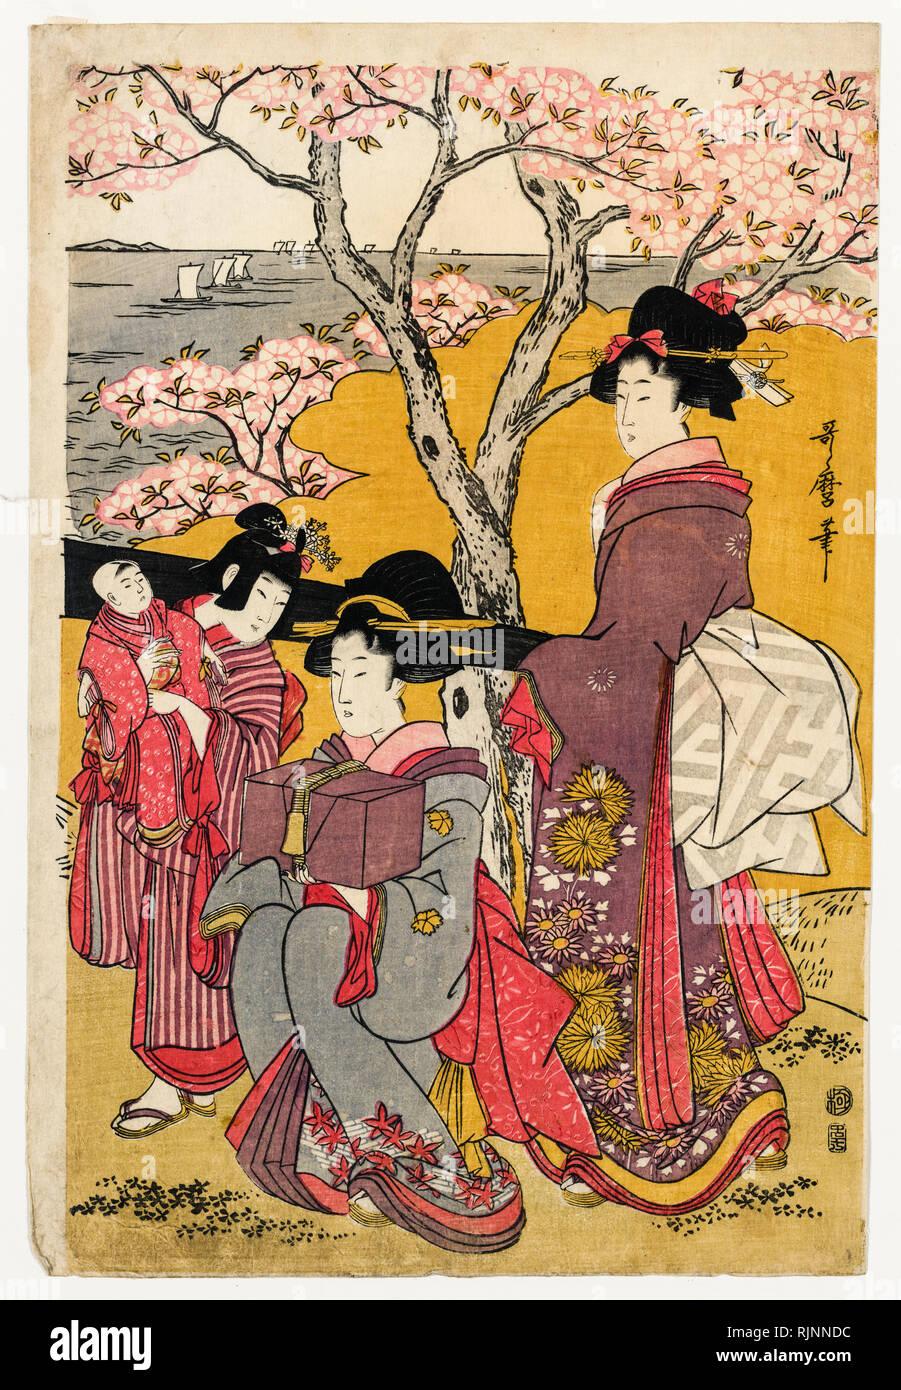 Arte japonés, Kitagawa Utamaro, 1805, Cherry viendo en Gotenyama, xilografía imprimir Imagen De Stock